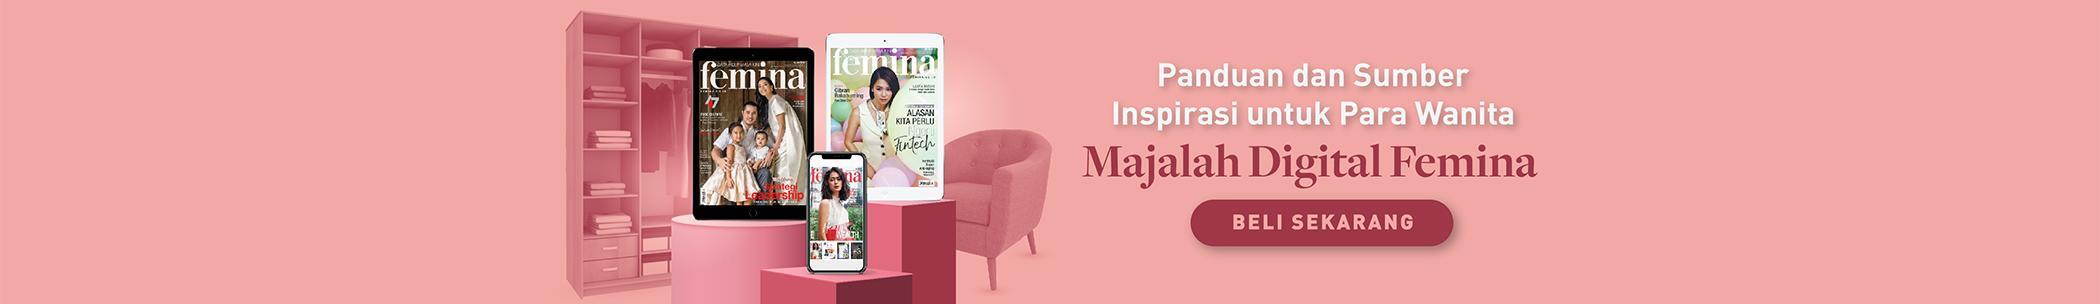 Majalah Digital Femina ada di Gramedia Digital.